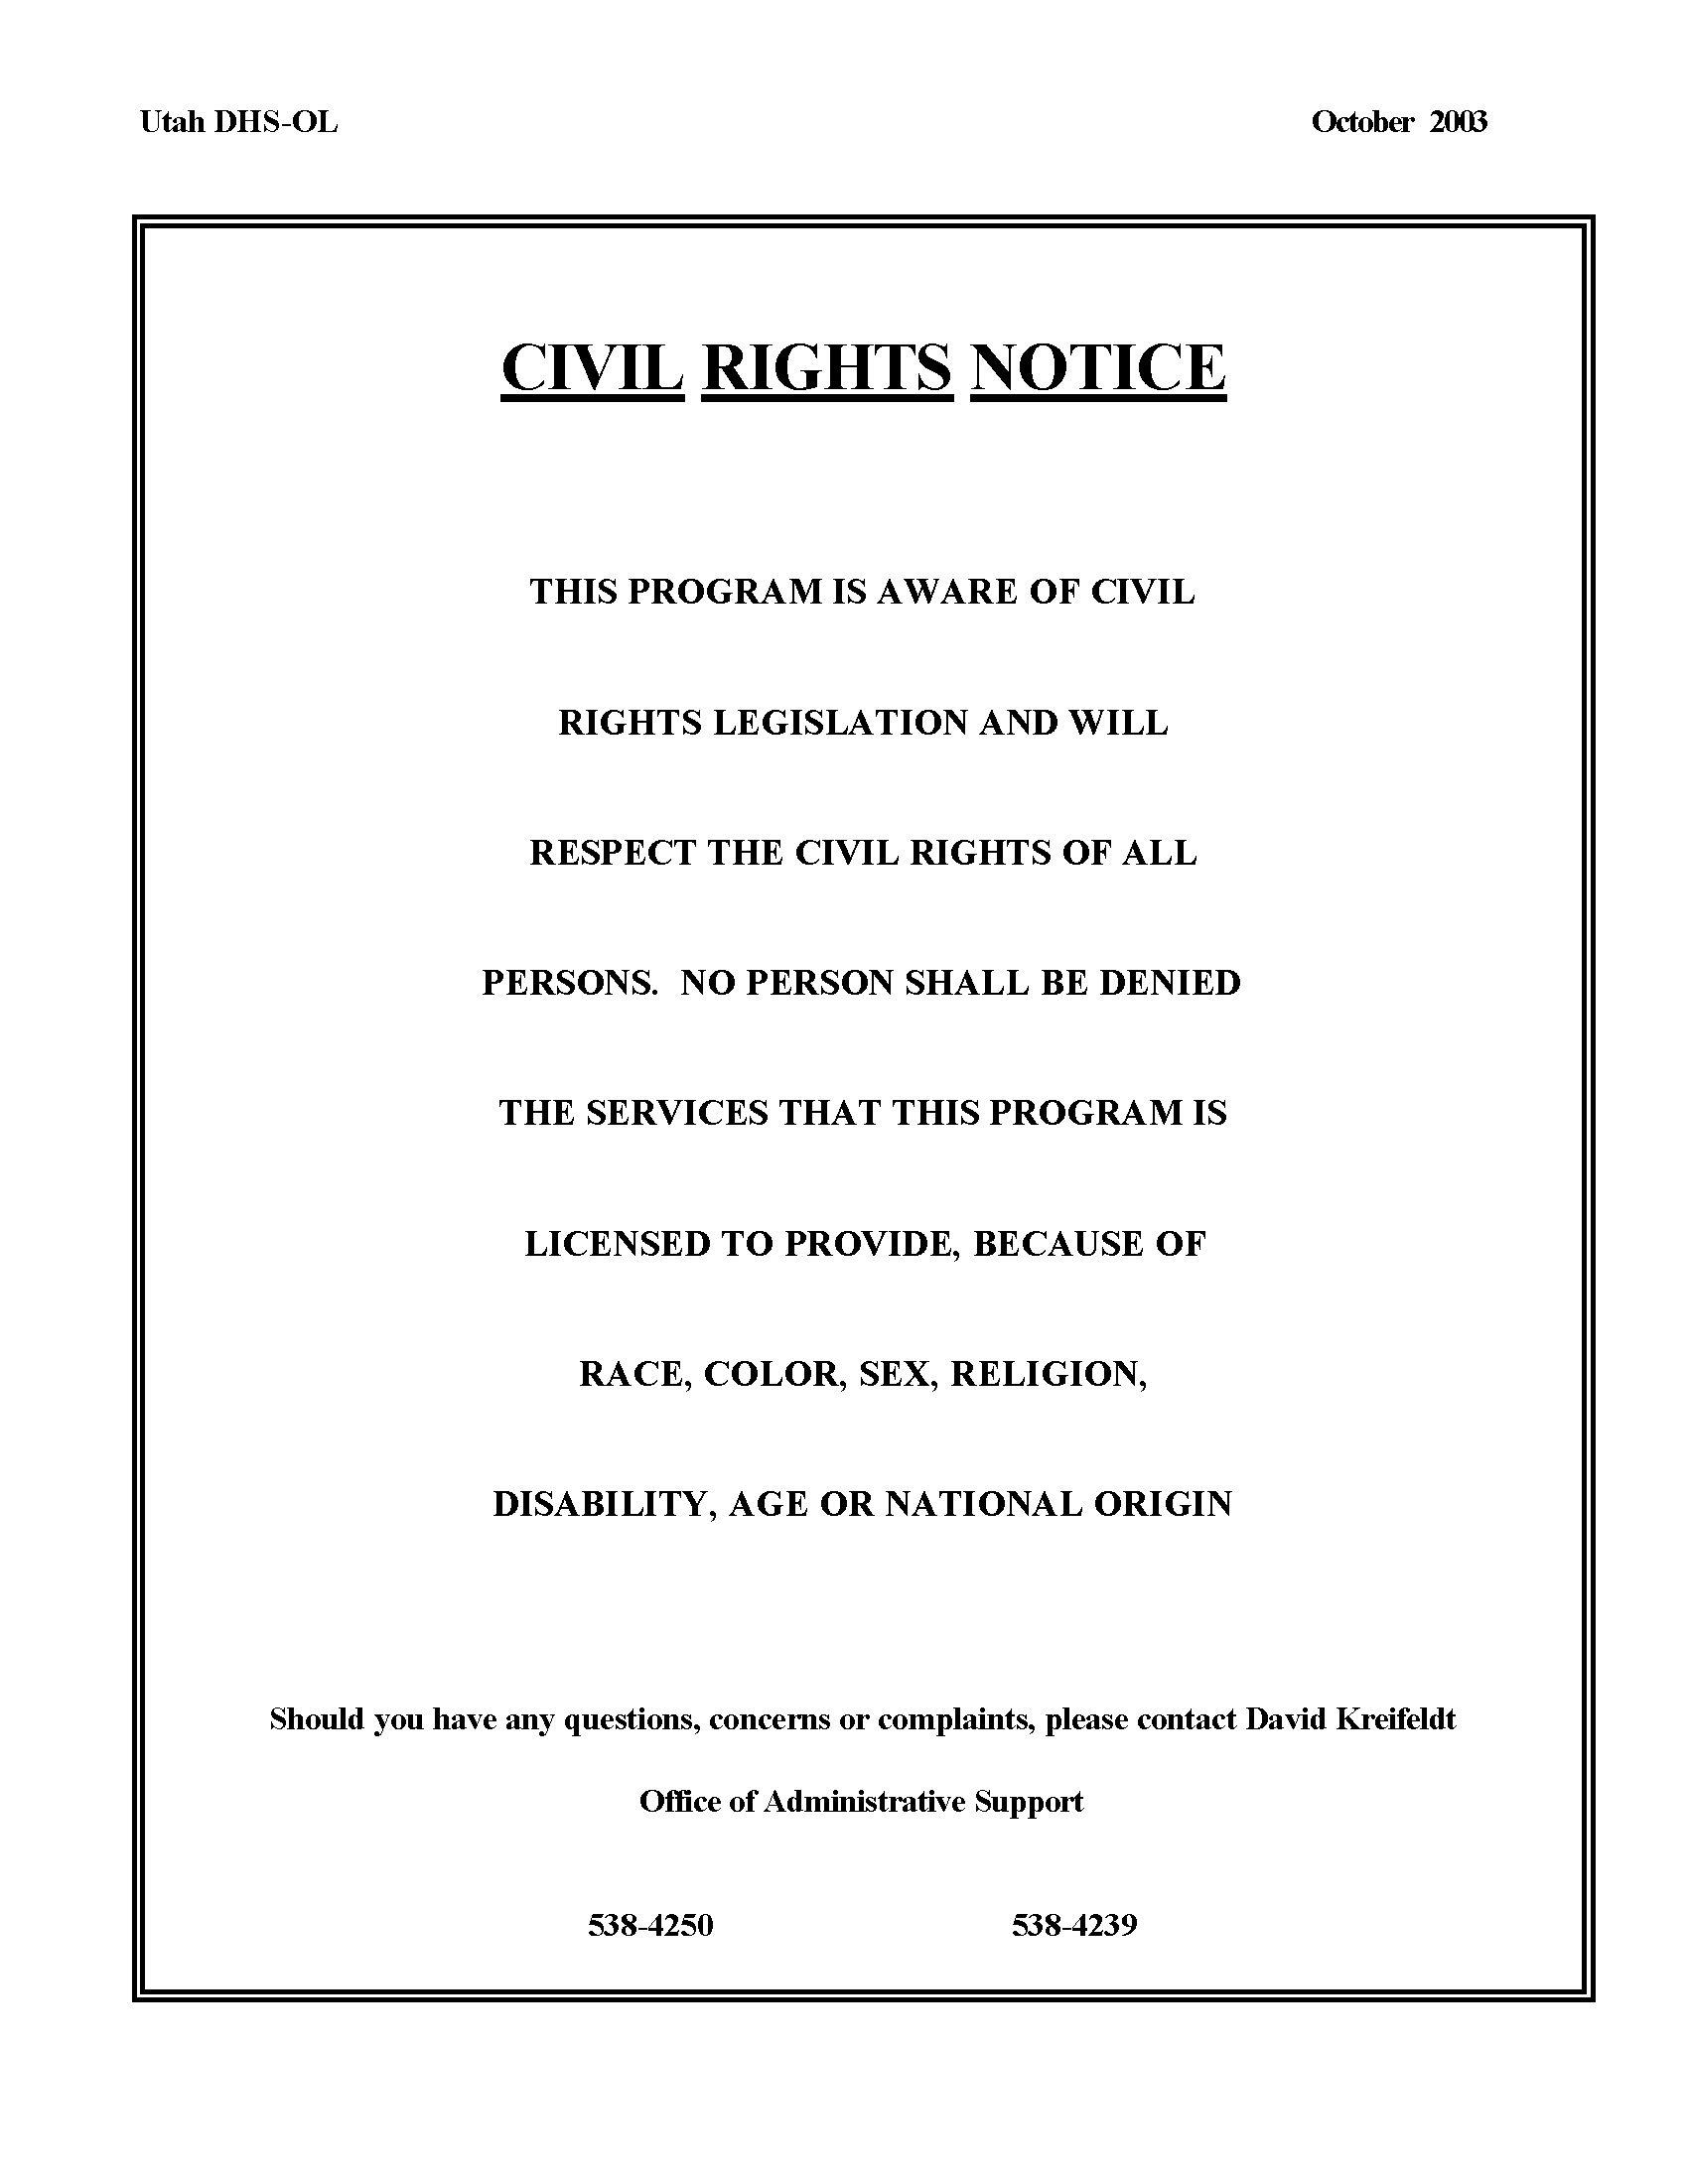 civil rights-poster.jpg